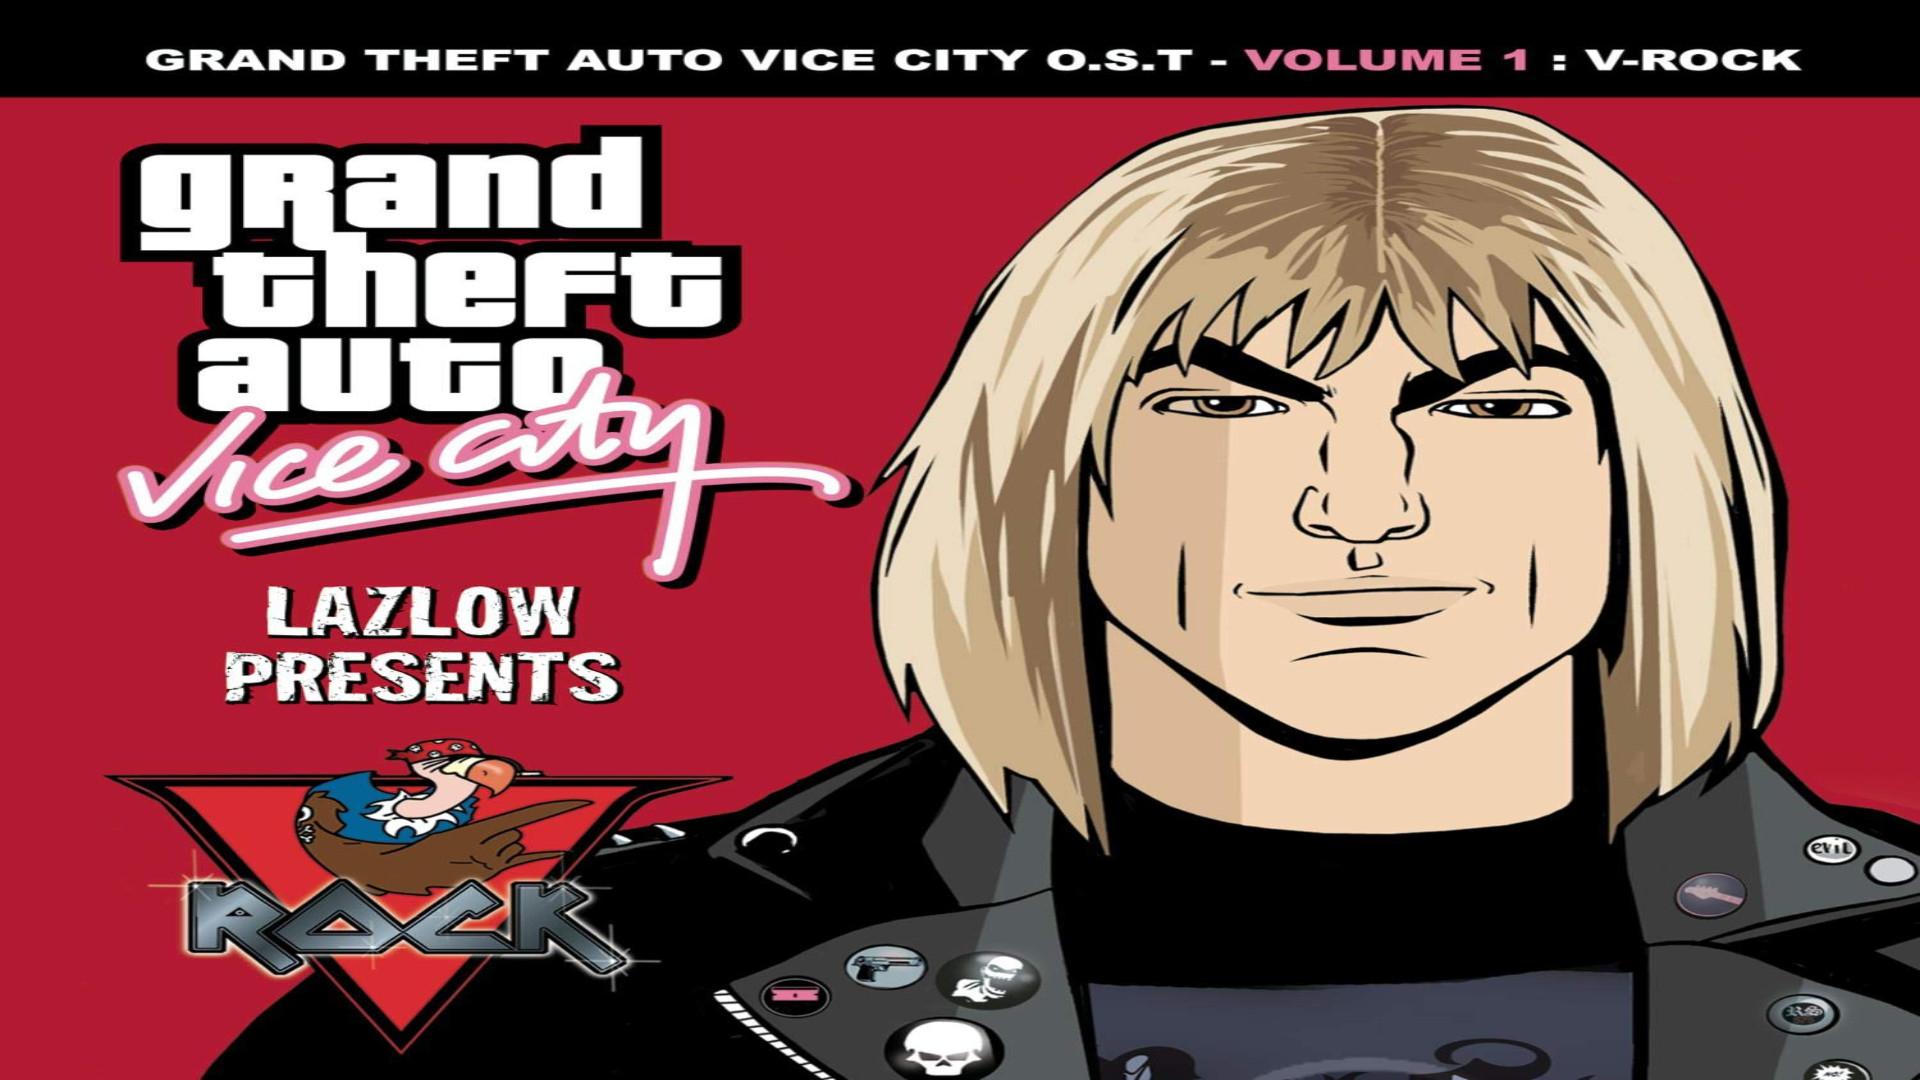 GTA vice city video game music